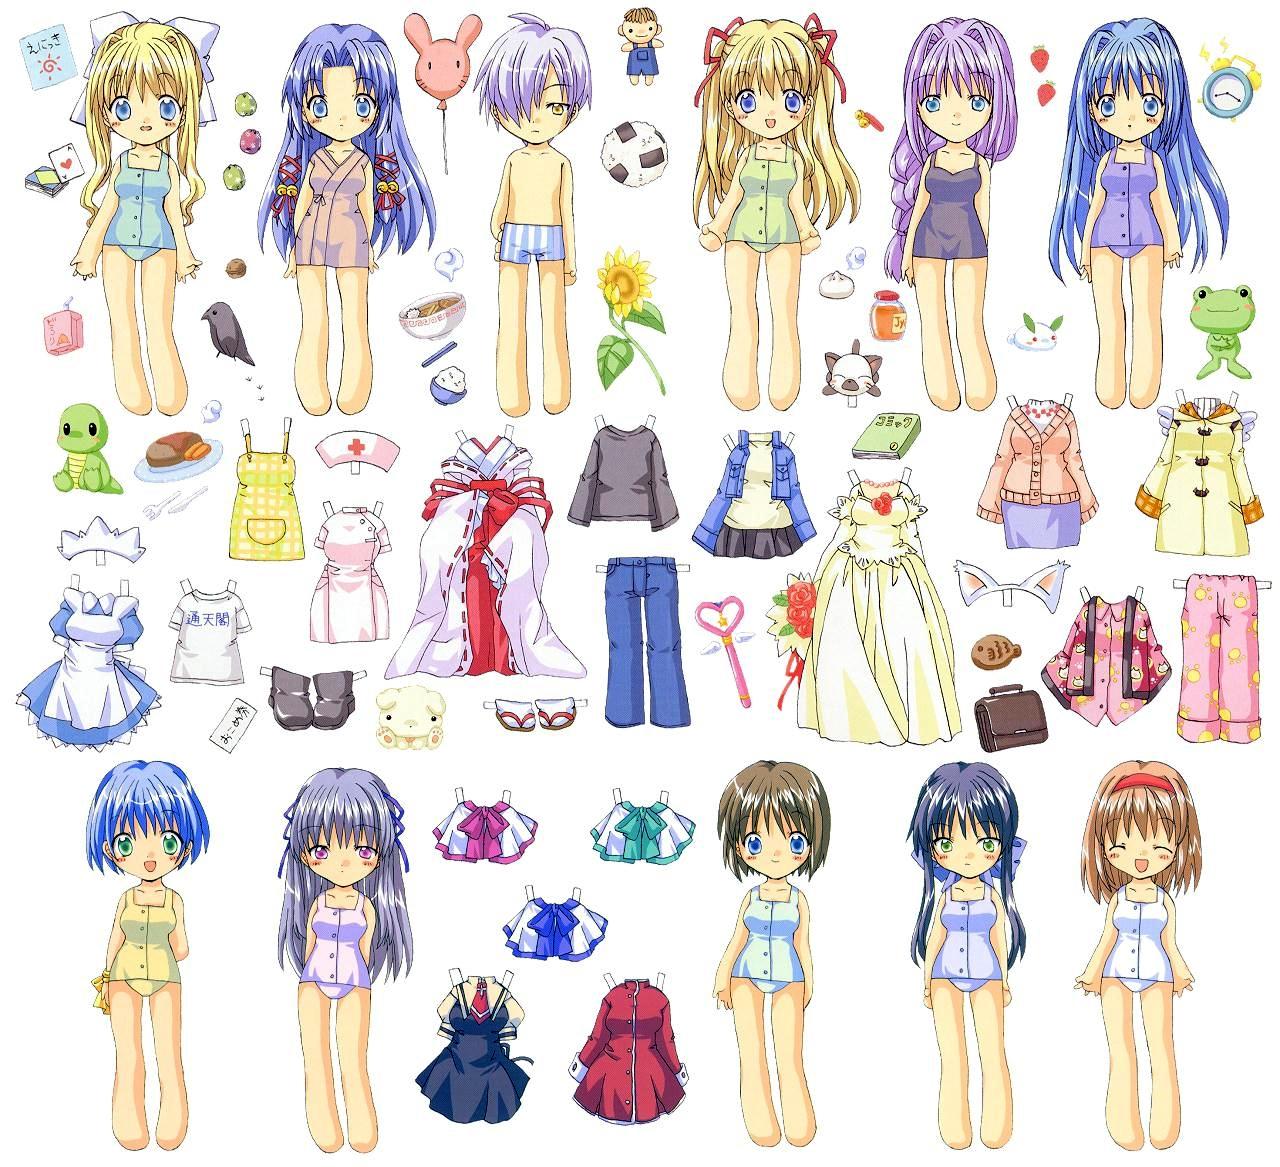 Paper Dolls - kiddies types on Pinterest | Paper Dolls ...